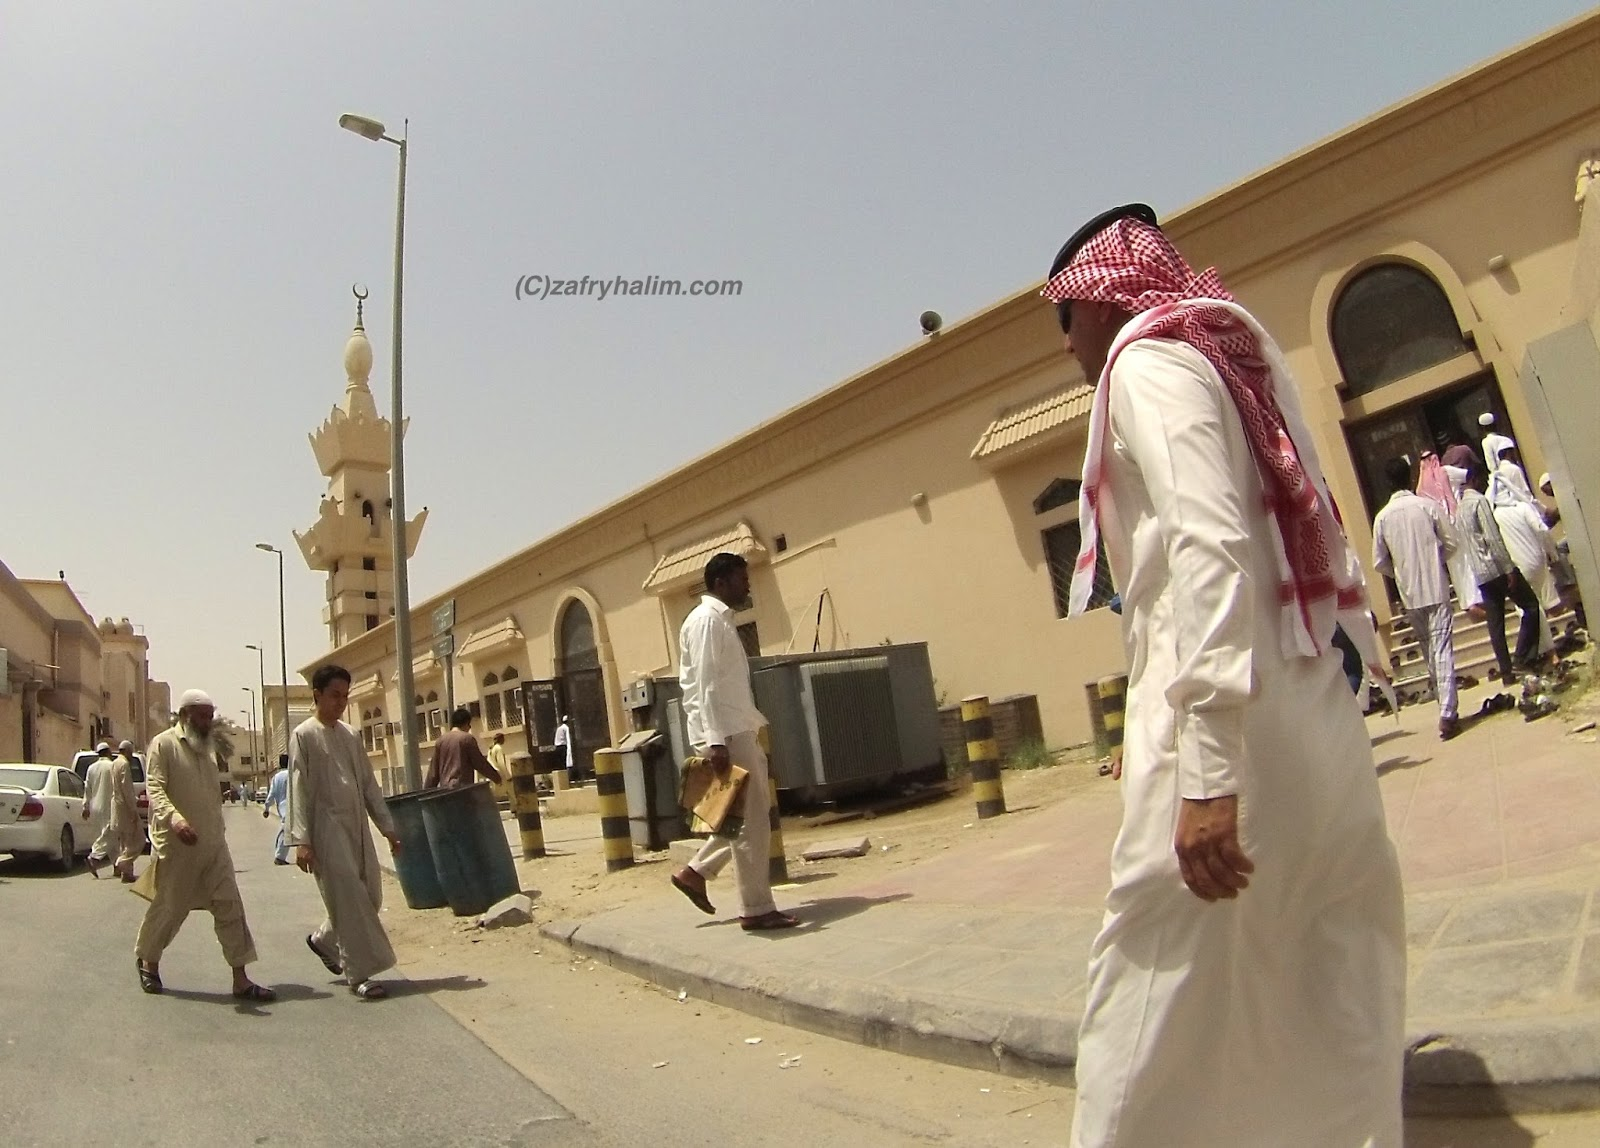 Saudi Dating - Saudi Arabia Dating Online - LoveHabibi